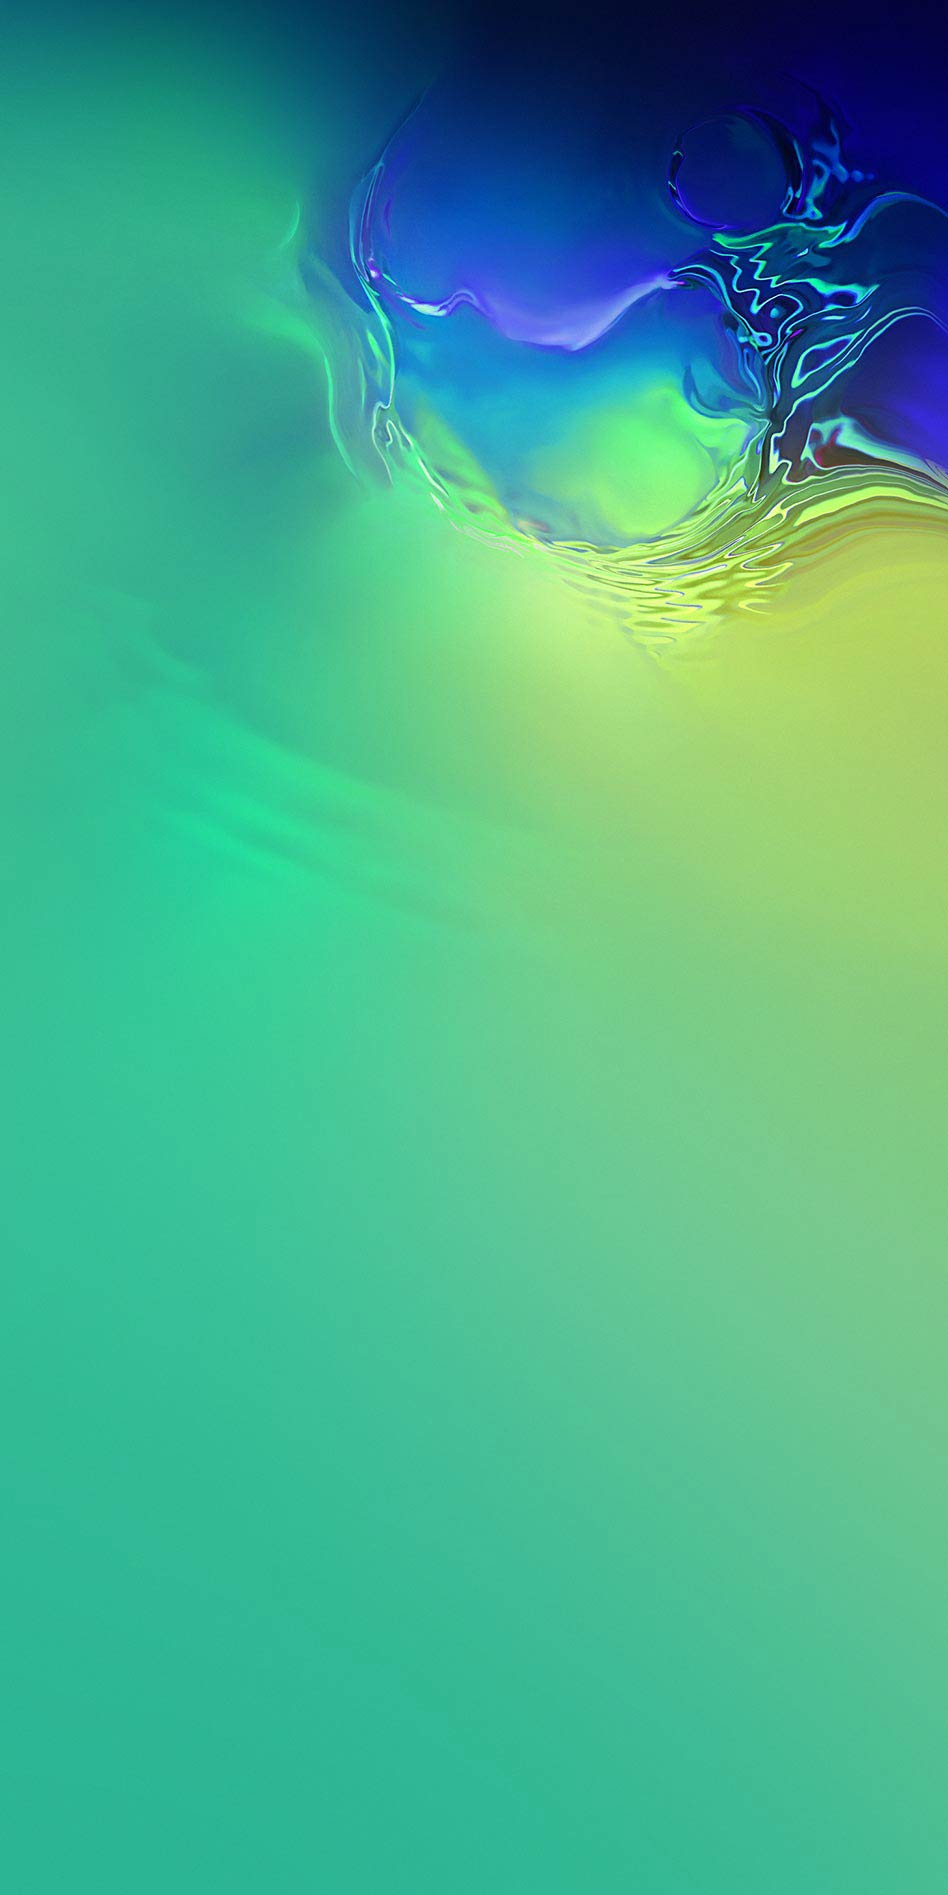 Best 12 Samsung Galaxy S10 Wallpaper Full-HD Download ...